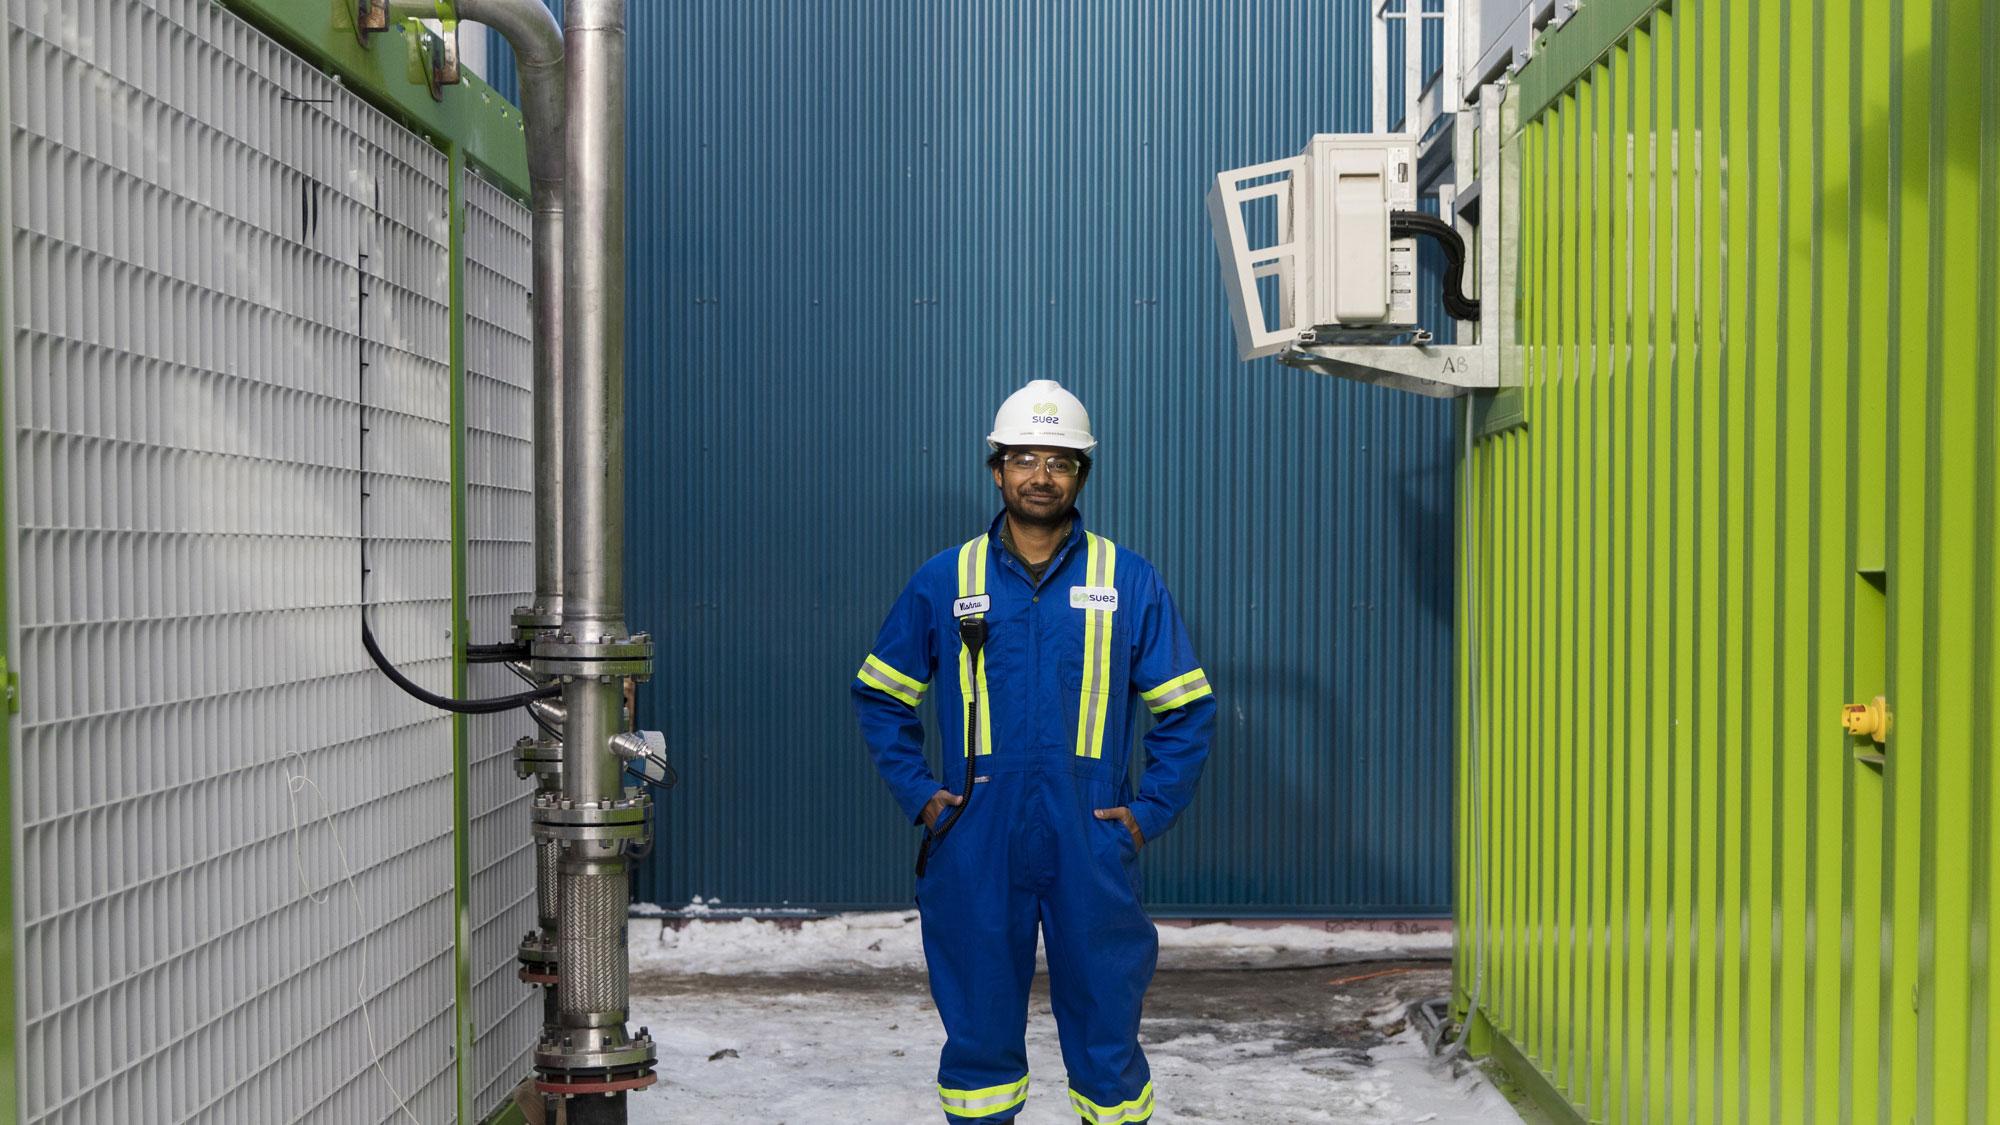 Employee WasteManagementCenter Edmonton Canada SUEZ